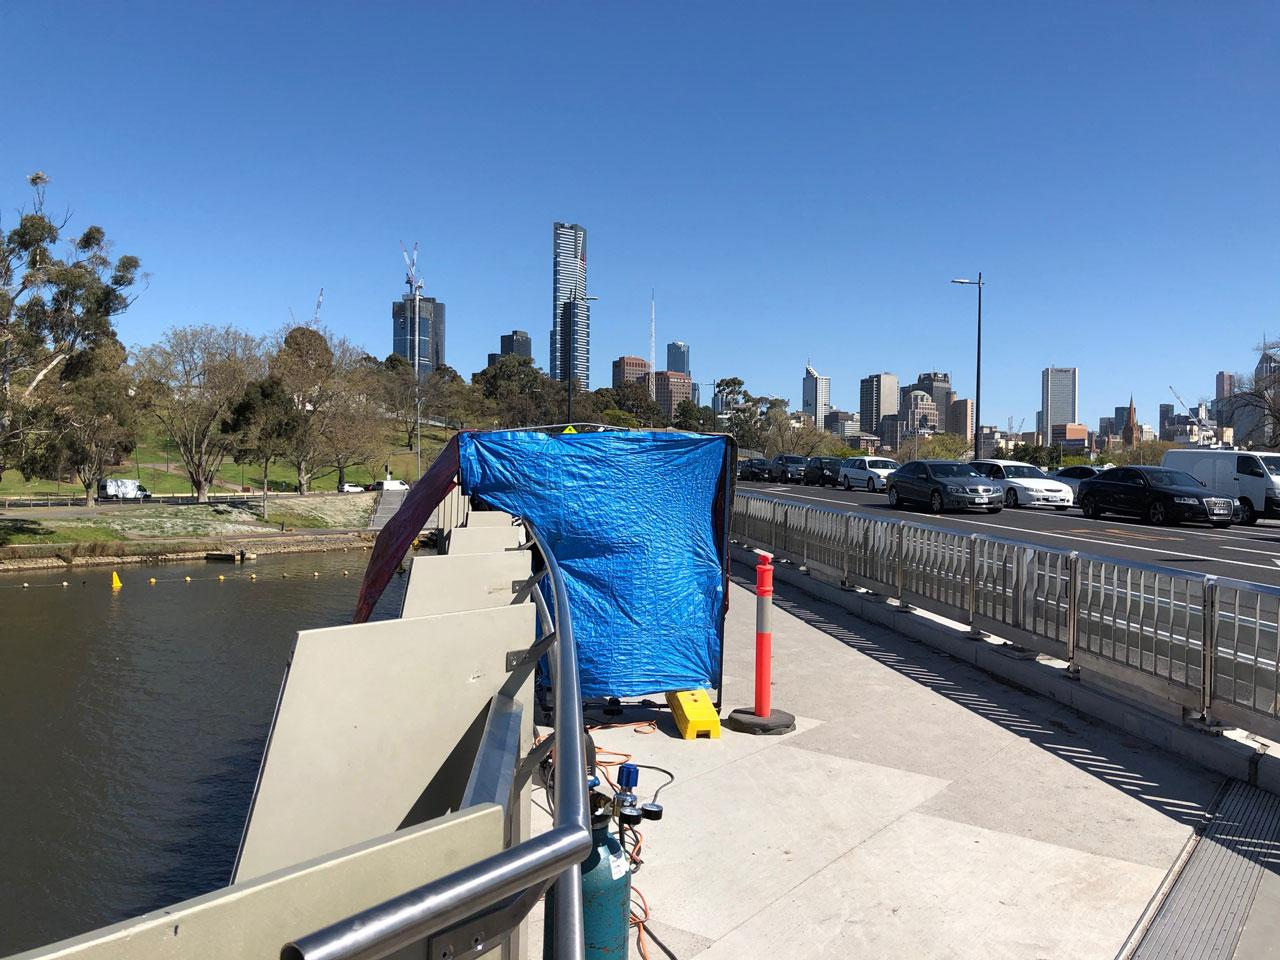 IMG_8374-Mechcon-Handrails-and-Balustrades-Melbourne-Victoria-Swan-Street-Widening-1280x960